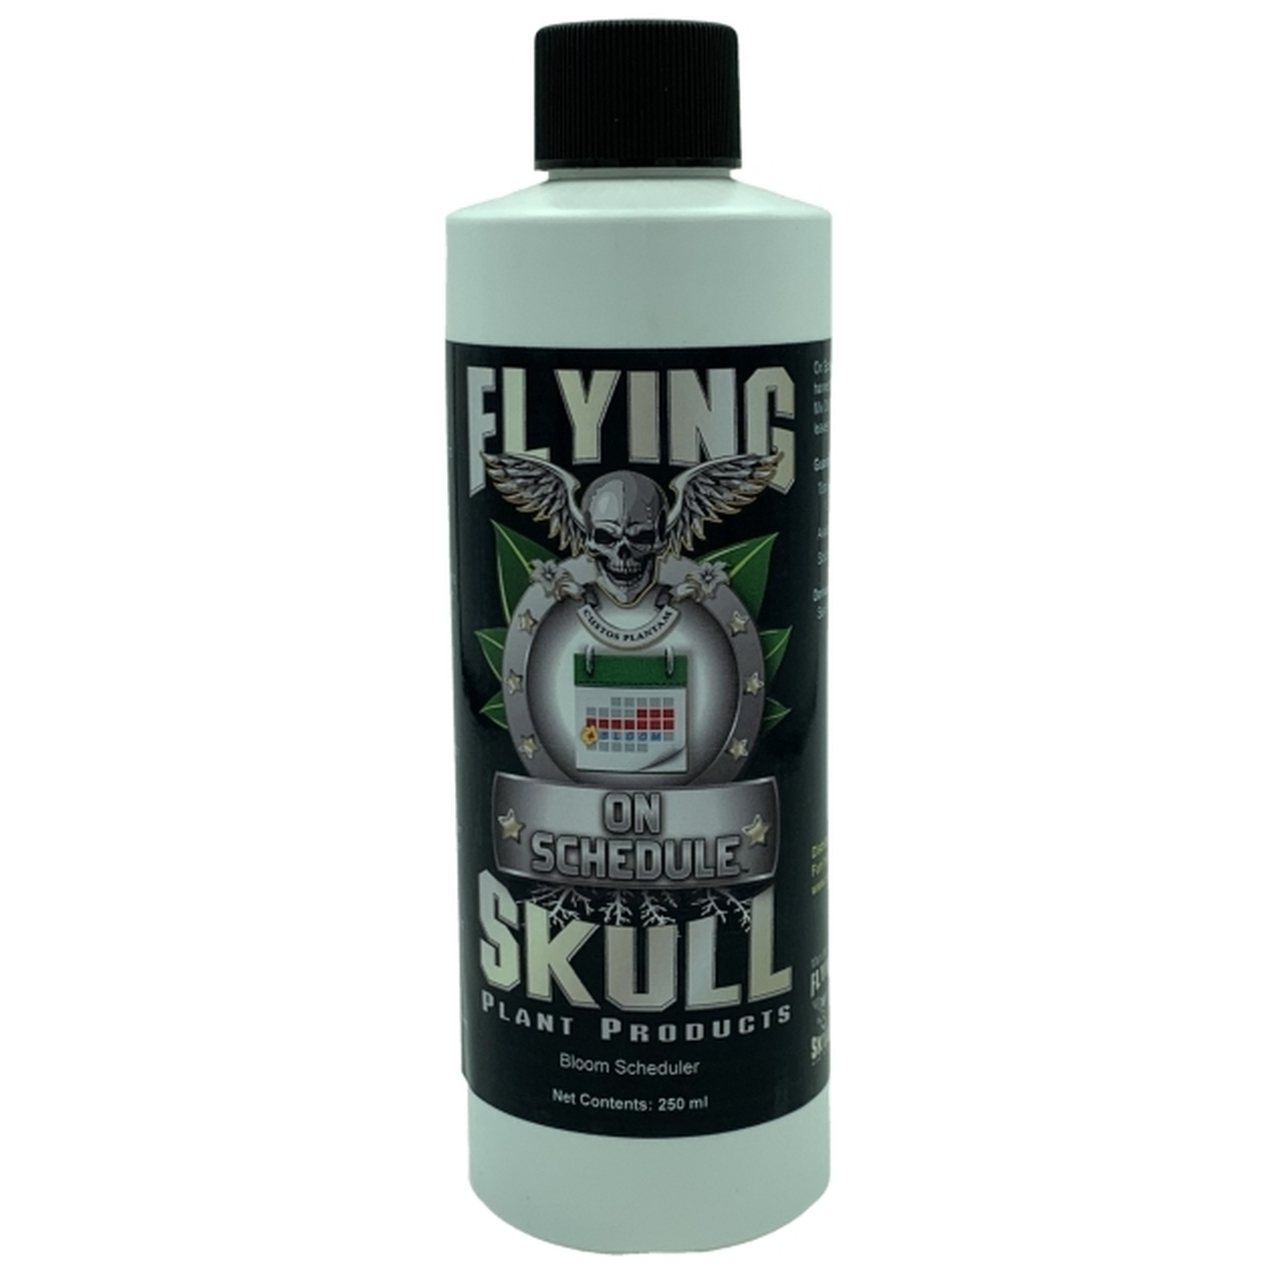 Flying Skull On Schedule 250ml Bottle Image